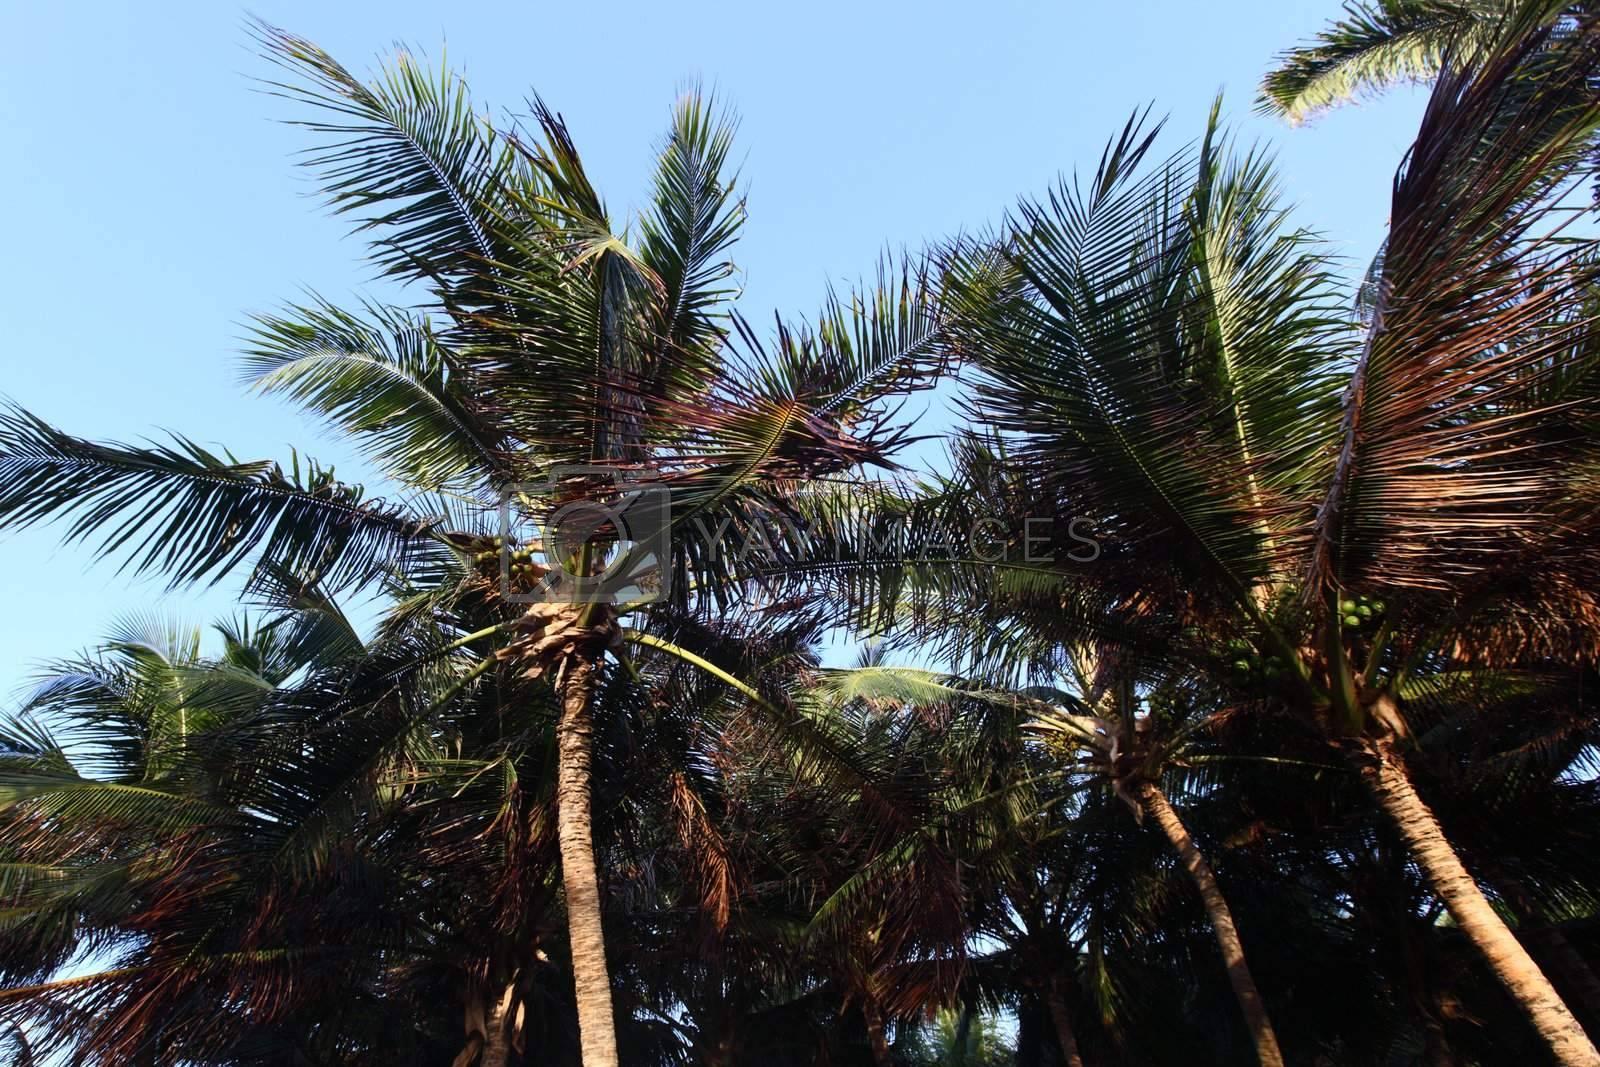 palm green foliage  in blue sky